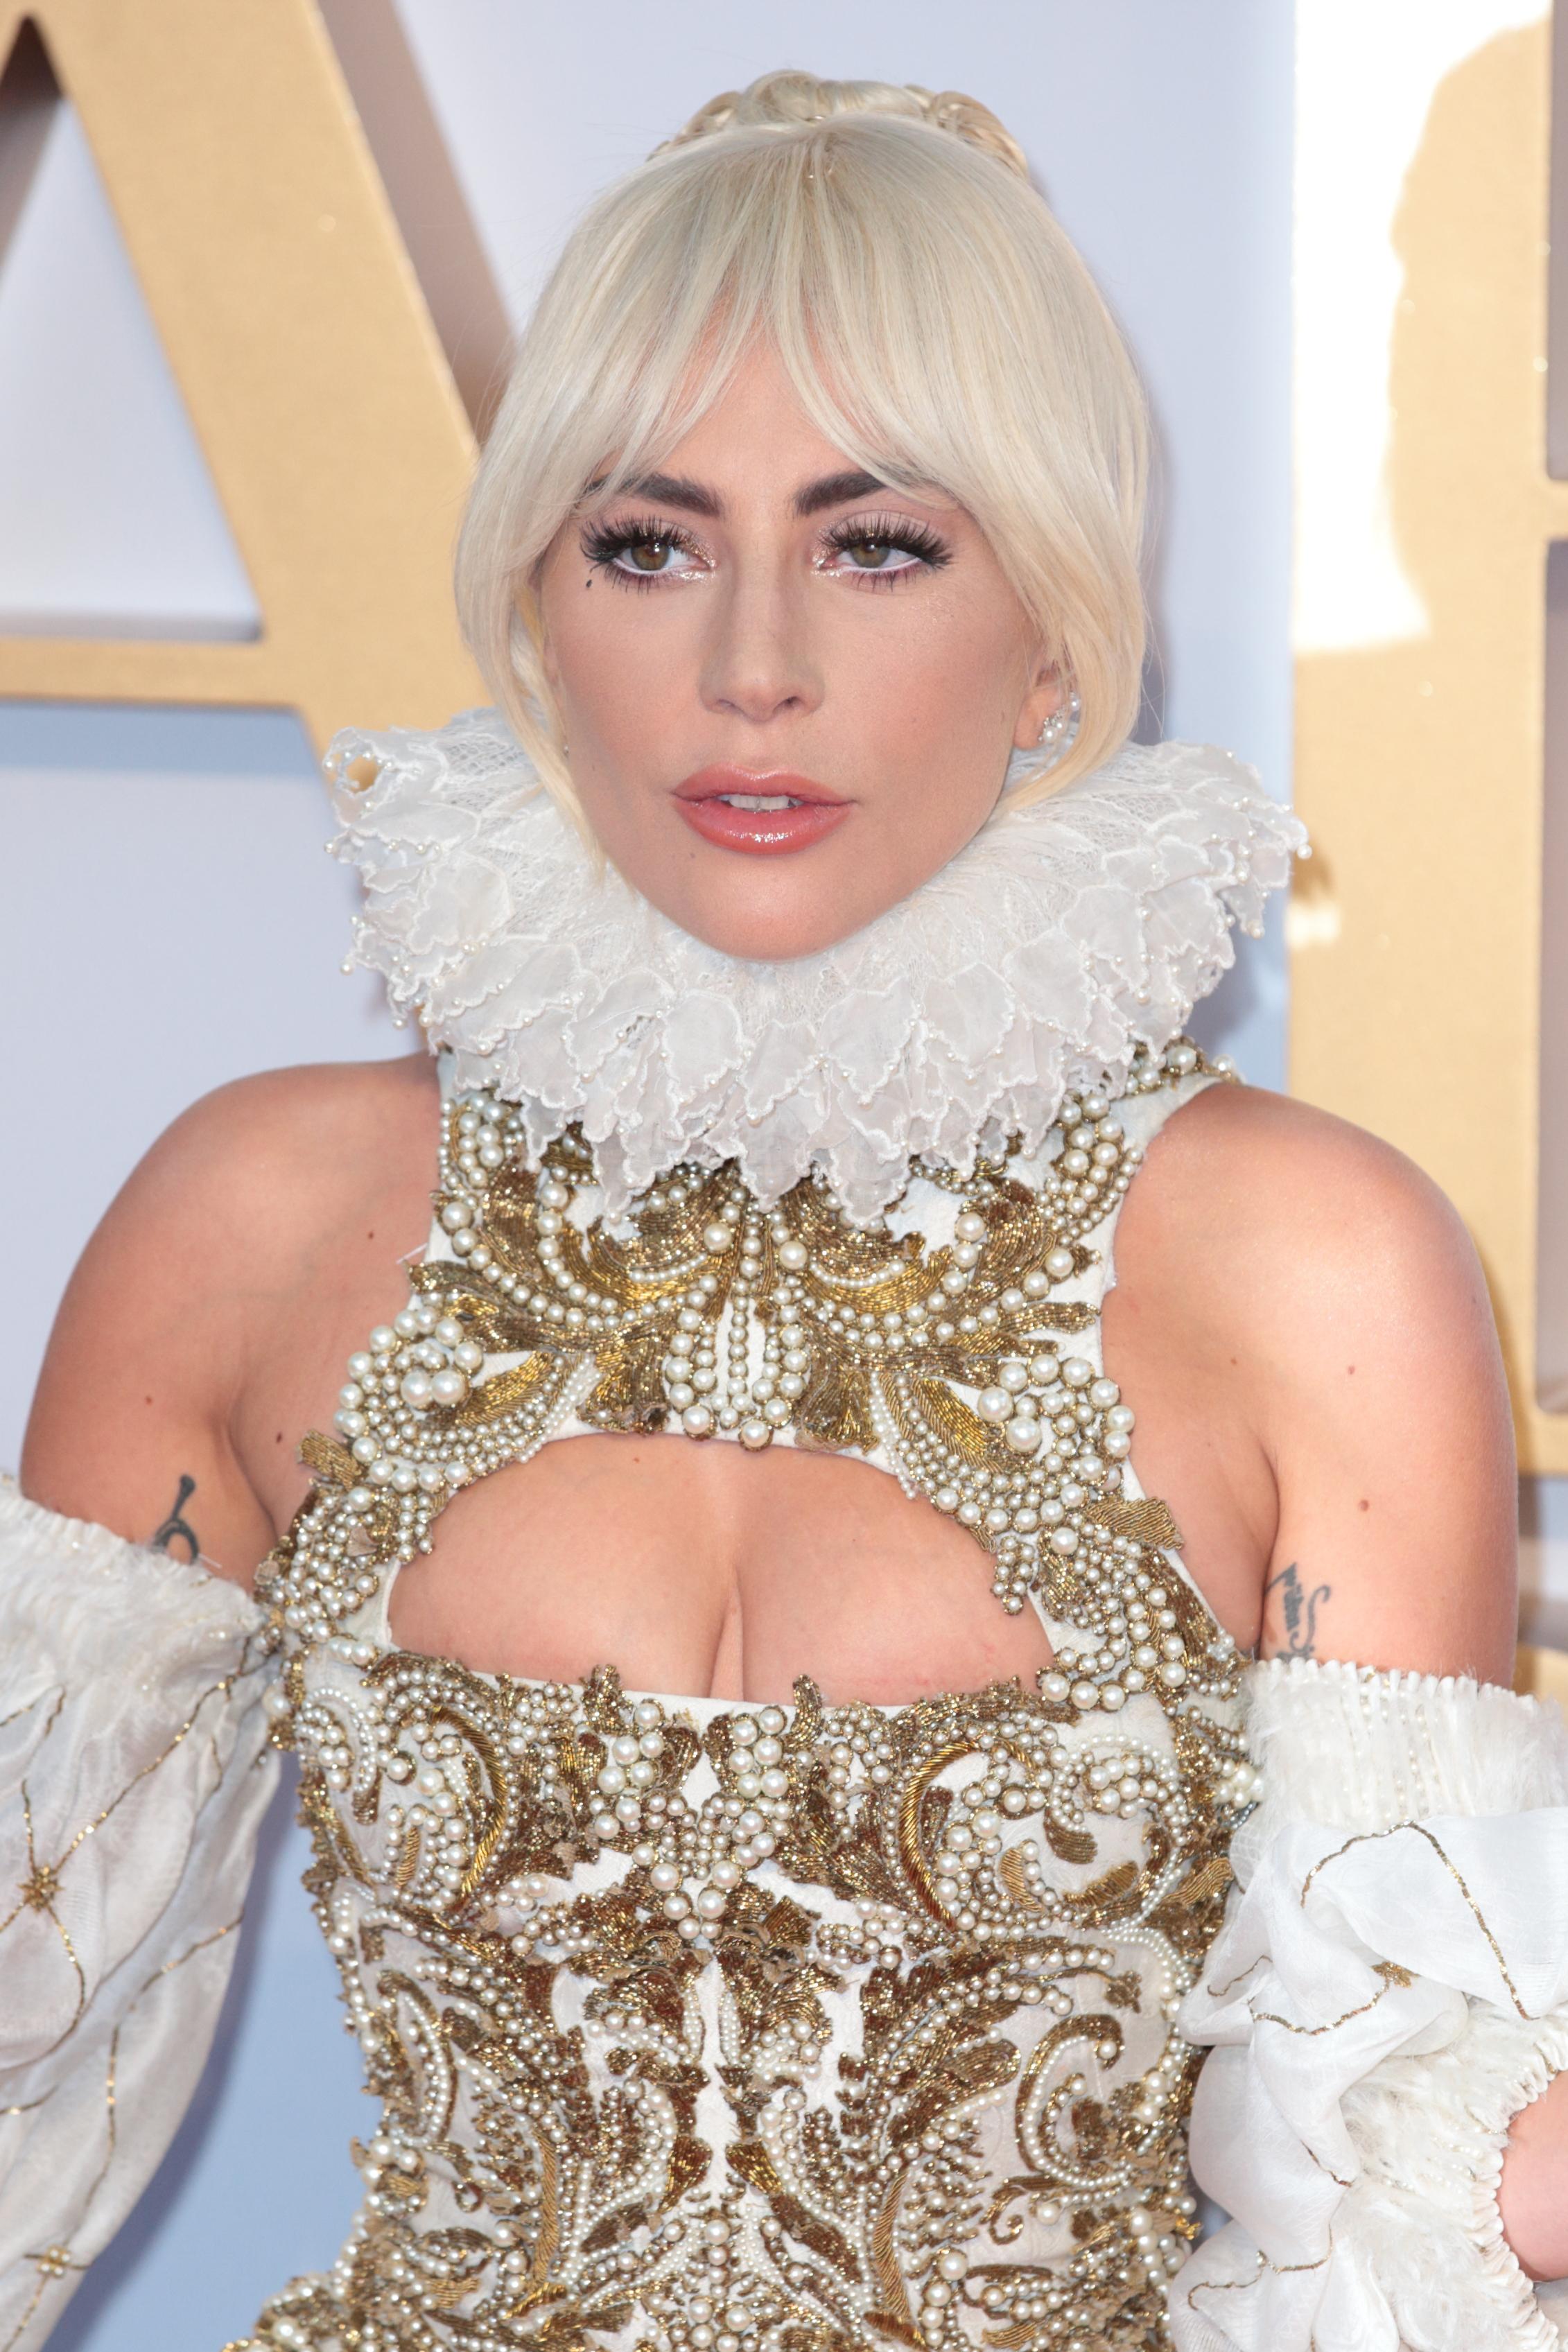 H Lady Gaga έκανε κι άλλο makeunder (εδώ θα δεις τι είναι το makeunder αν δεν το ξέρεις)! | tlife.gr